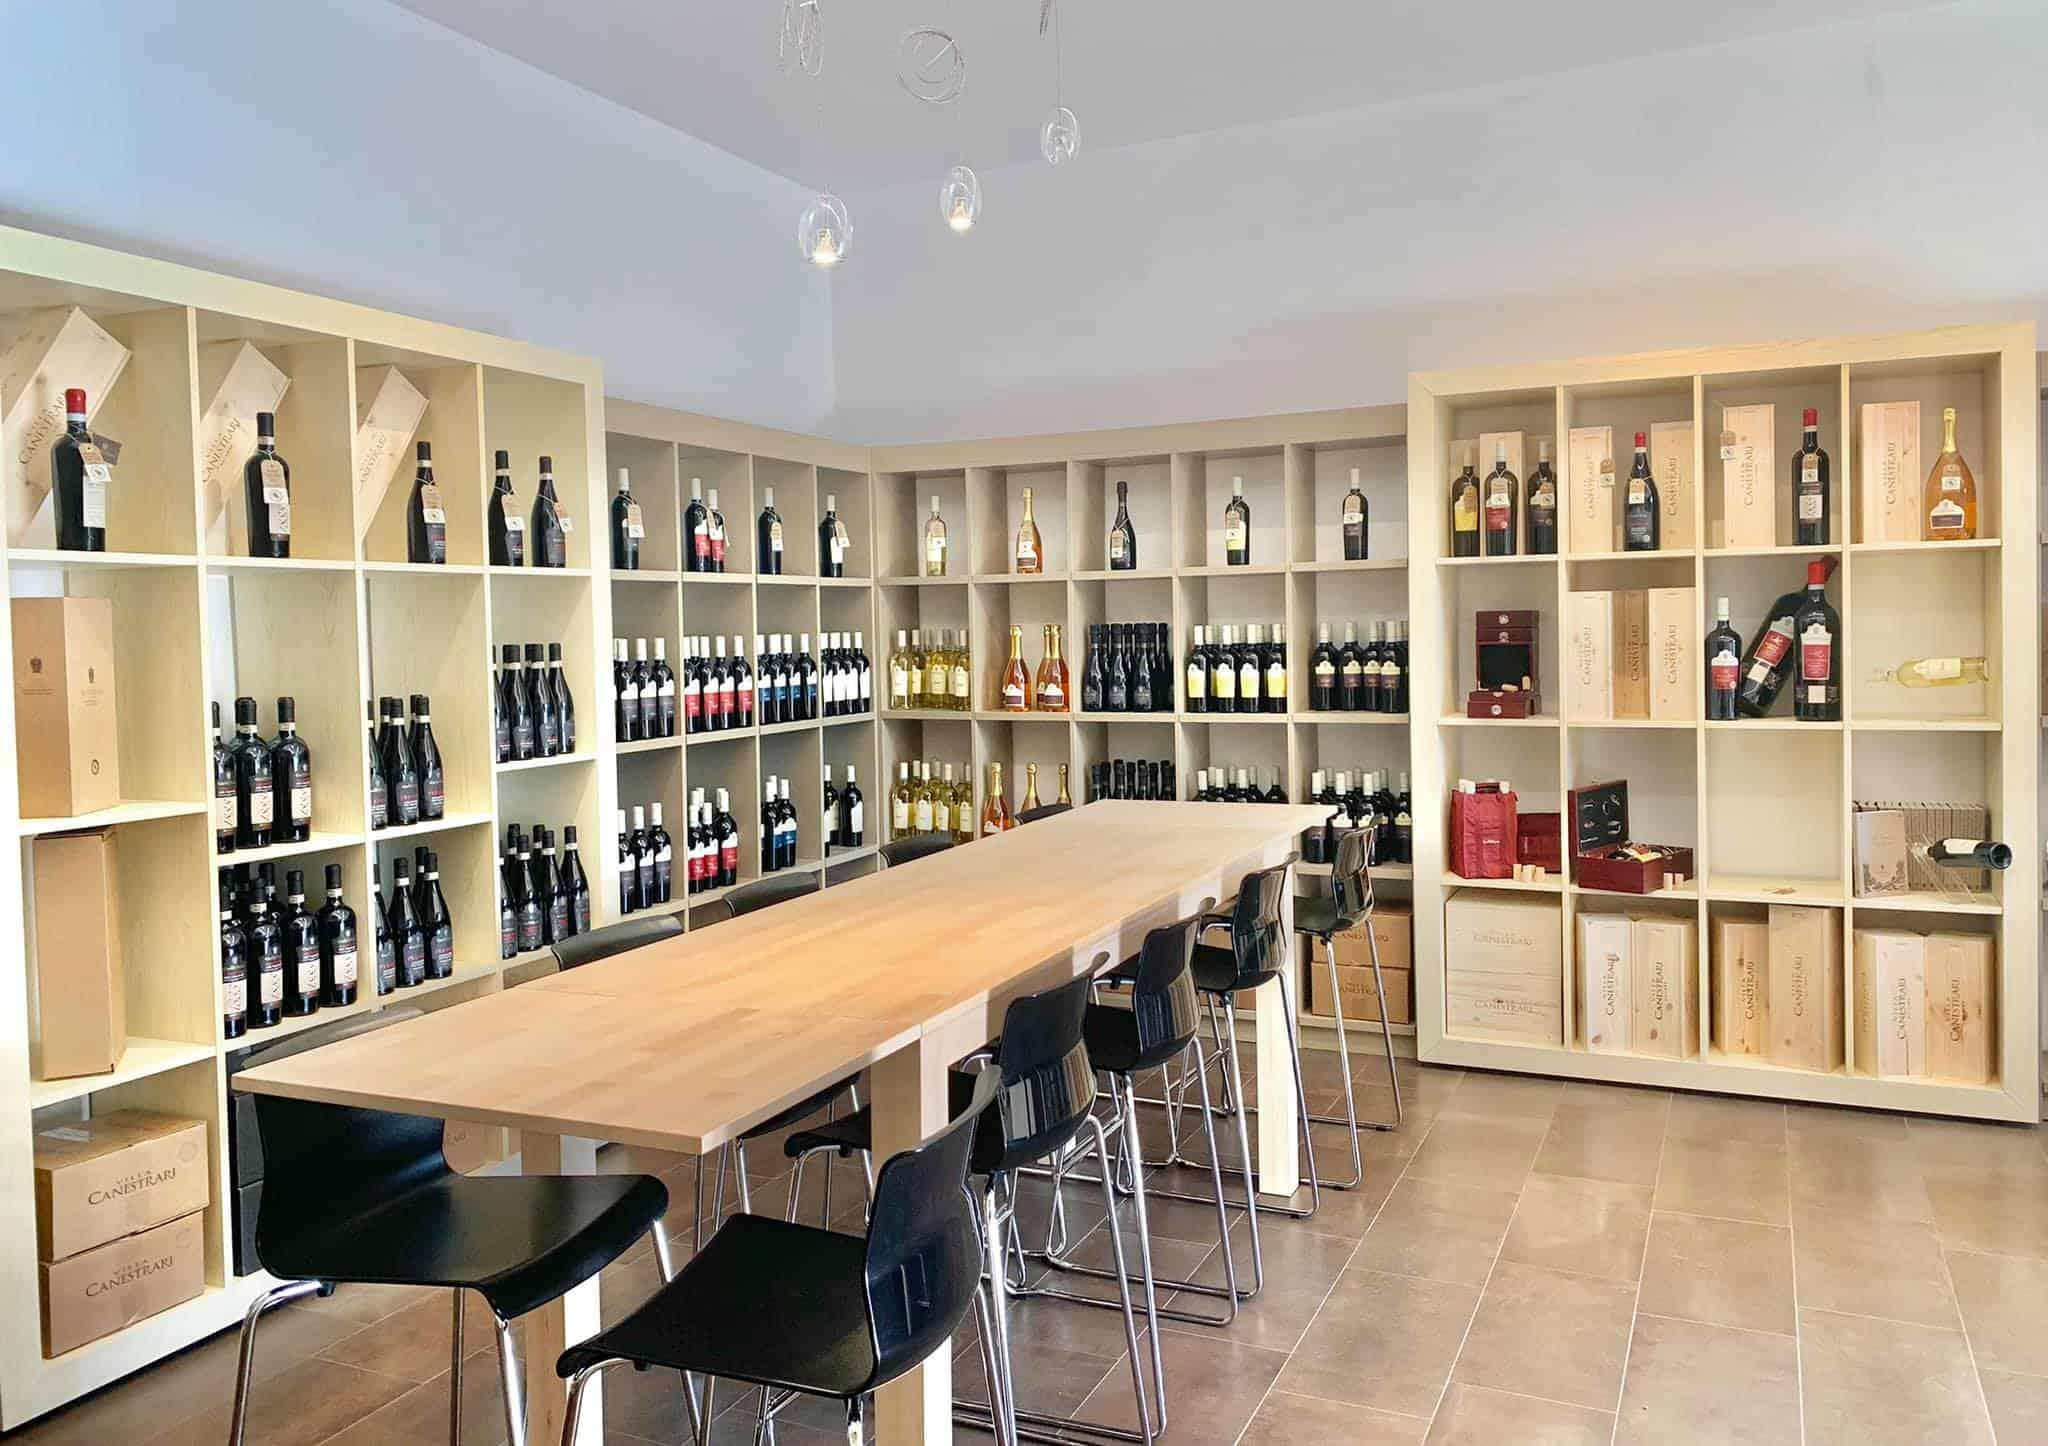 Wine Shop Villa Canestrari